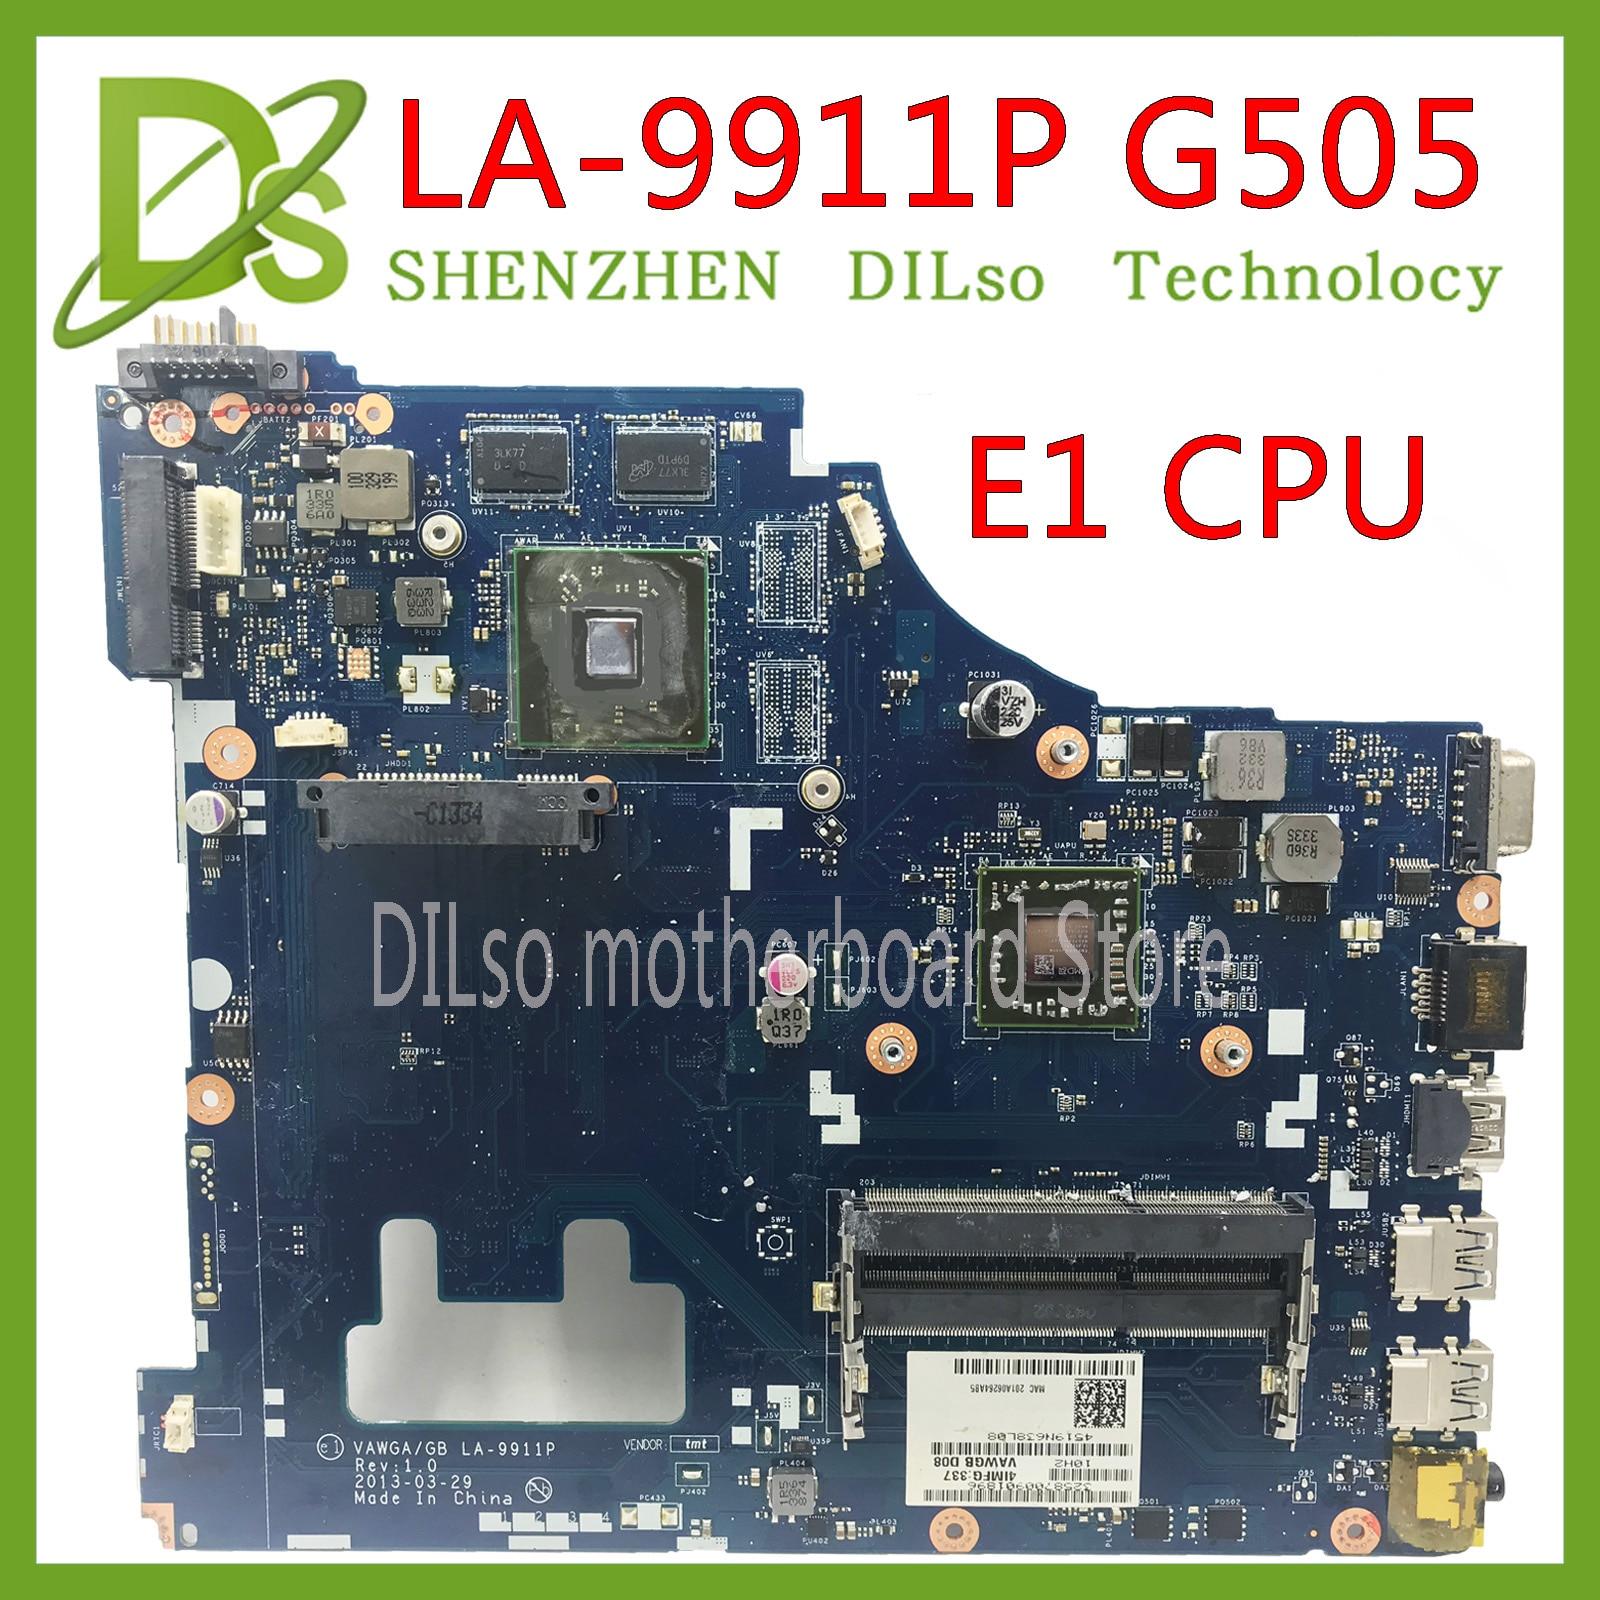 KEFU G505 VAWGA/GB la-9911p E1 LA-9911P motherboard para lenovo g505 motherboard CPU motherboard rev: 1.0 com Teste de CPU